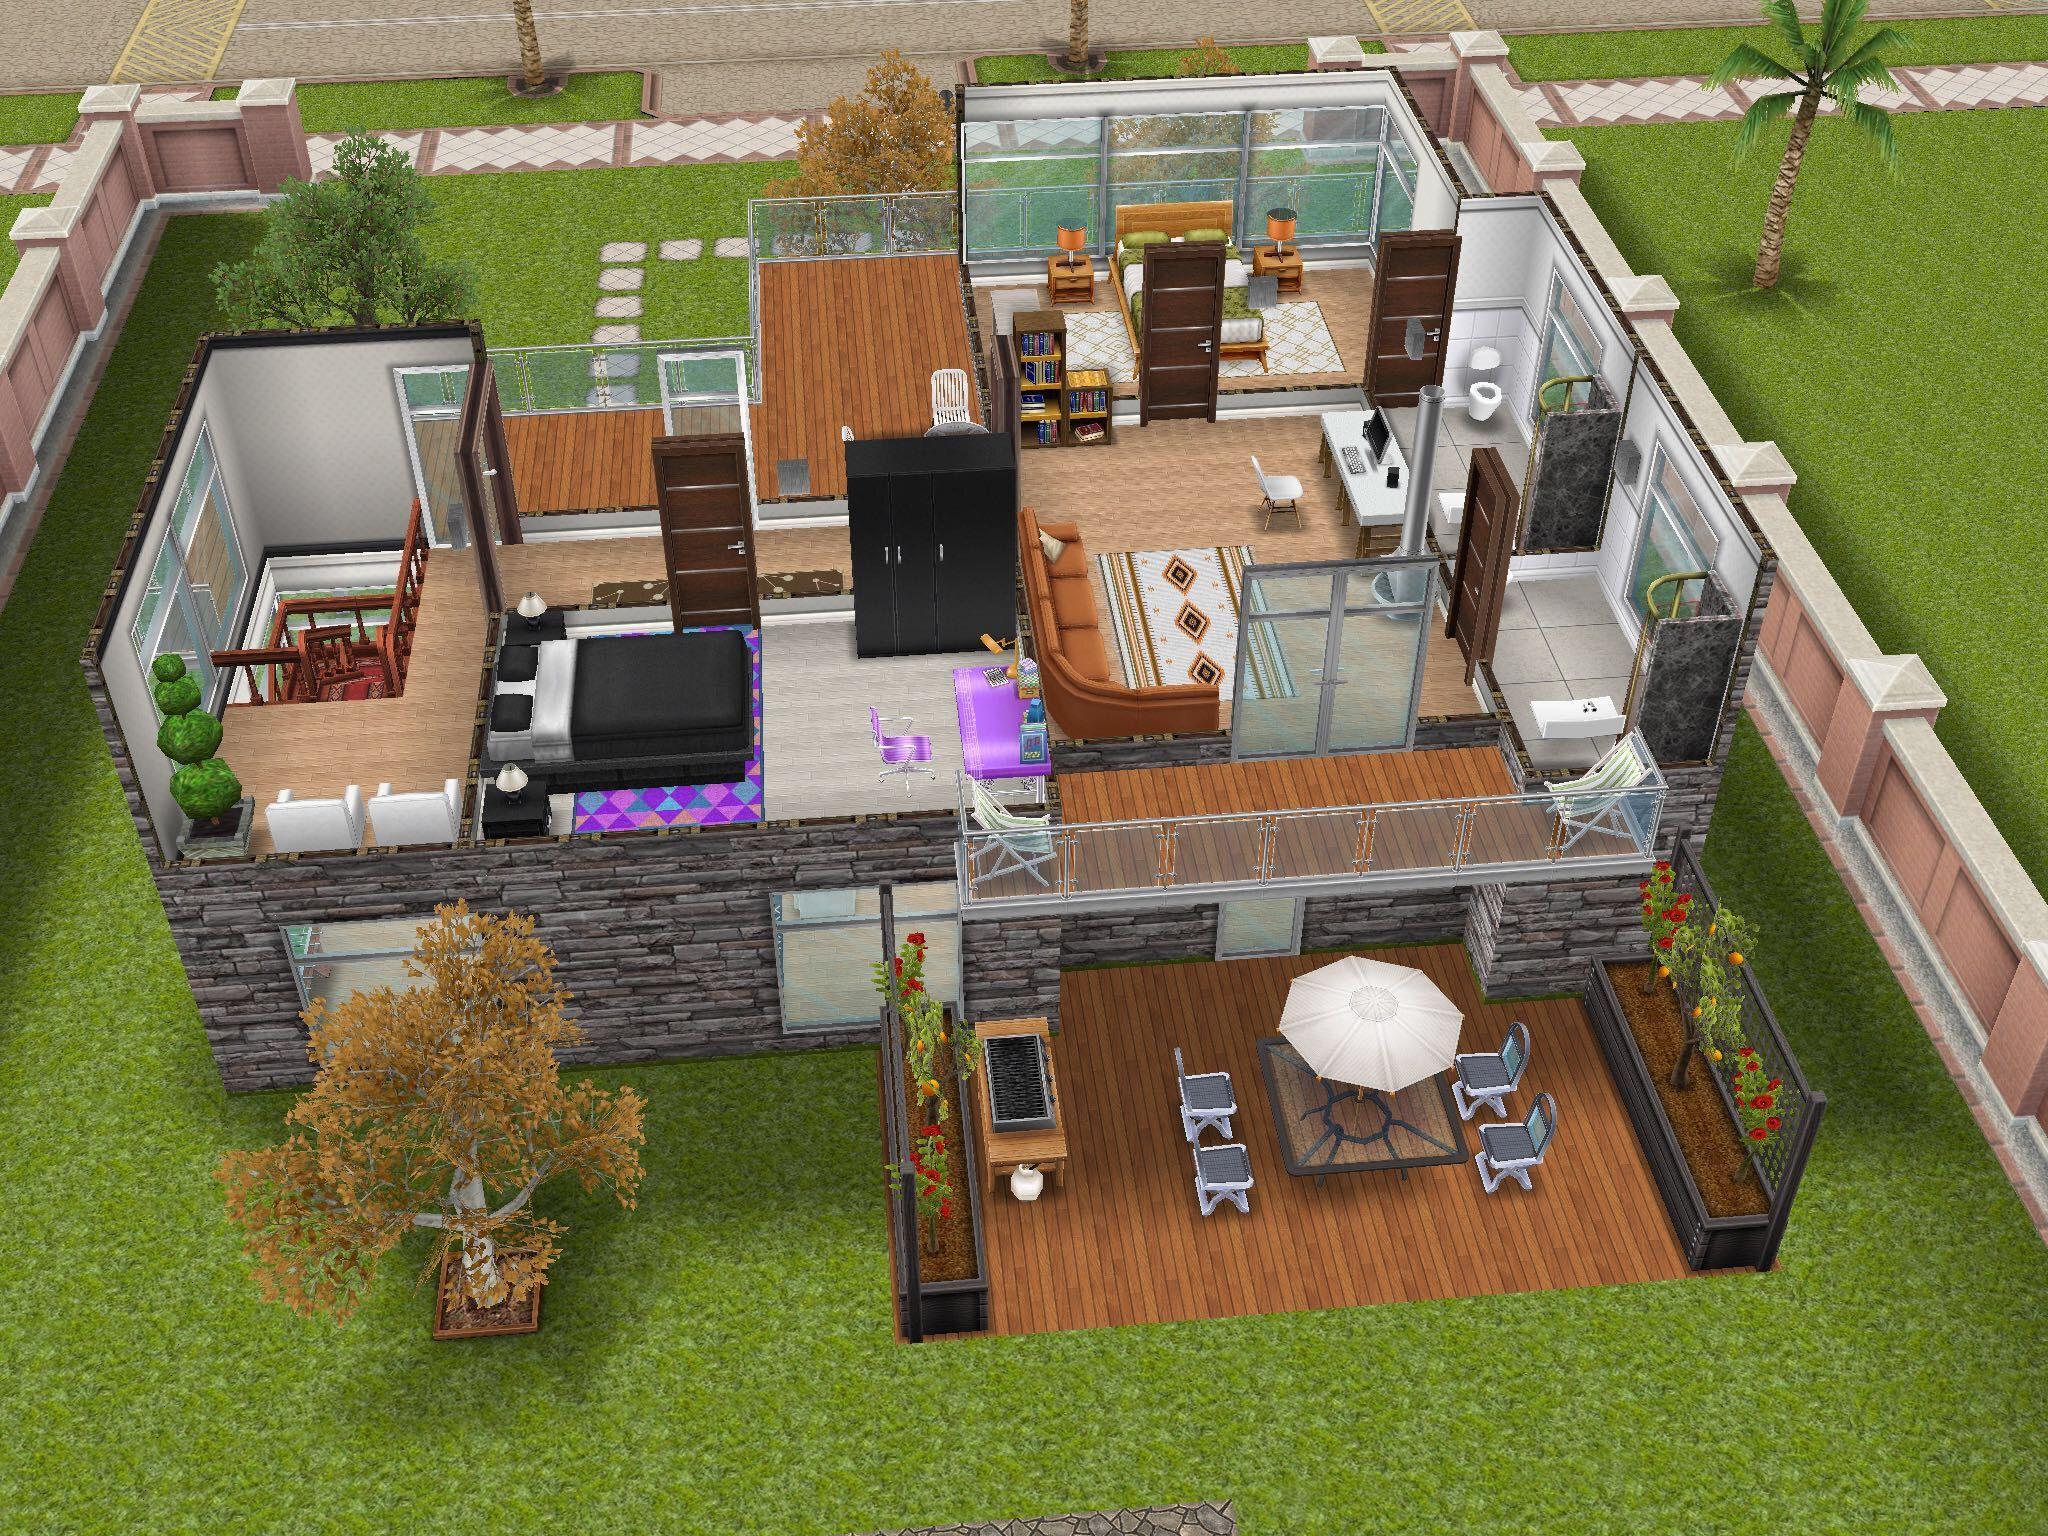 The Sims Free Play Modern House 2 Sims Thesims House Ideas Casas Arquitectura Disenos De Unas